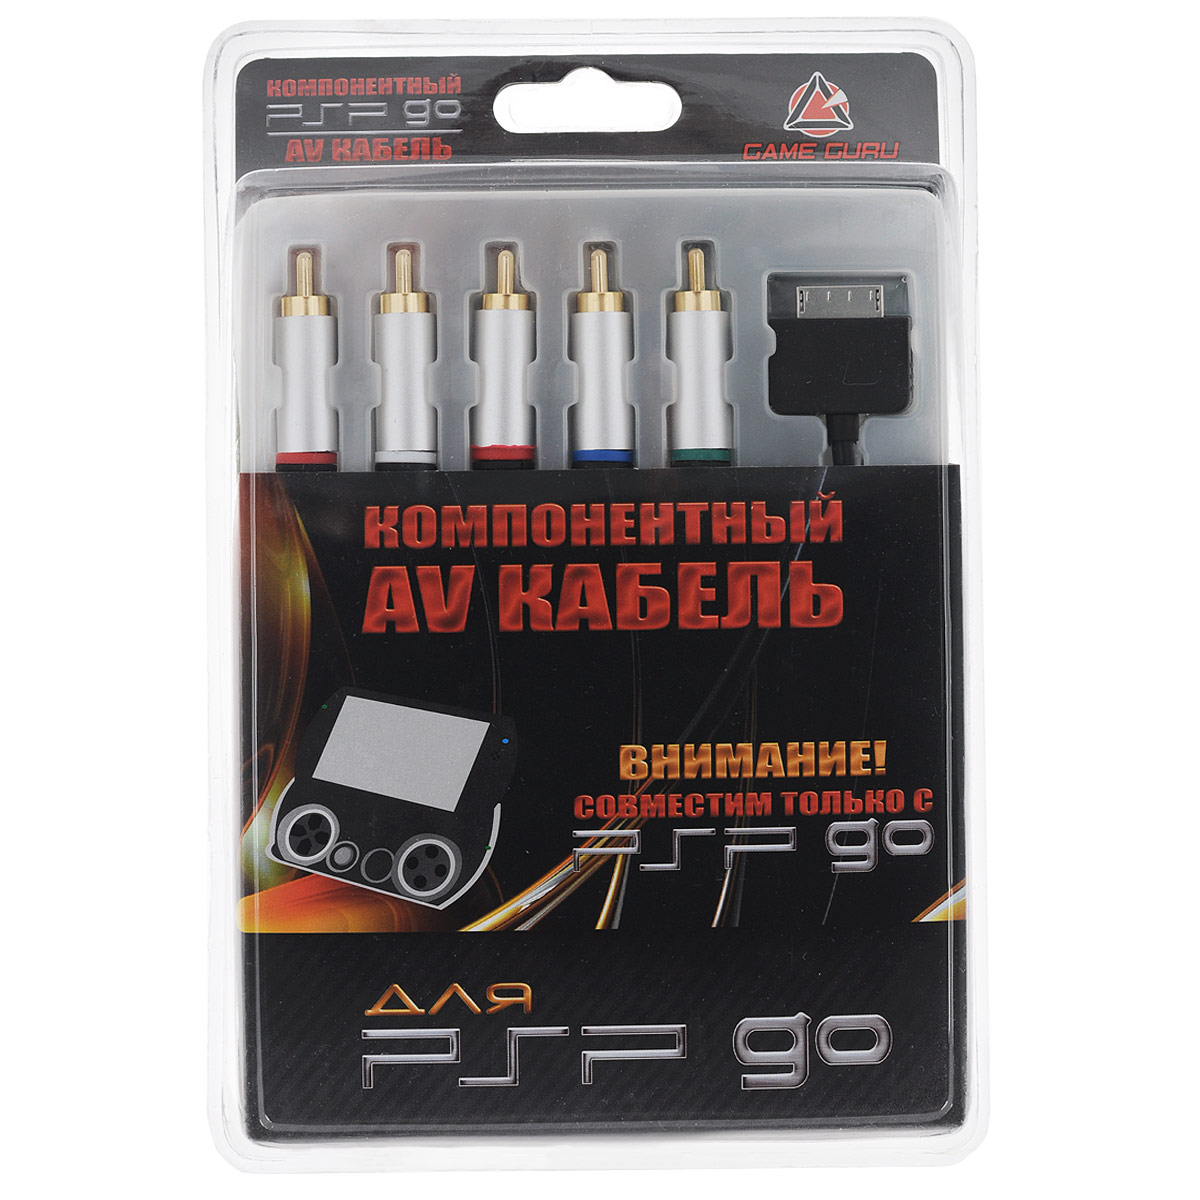 Компонентный AV кабель для PSP Go кабель